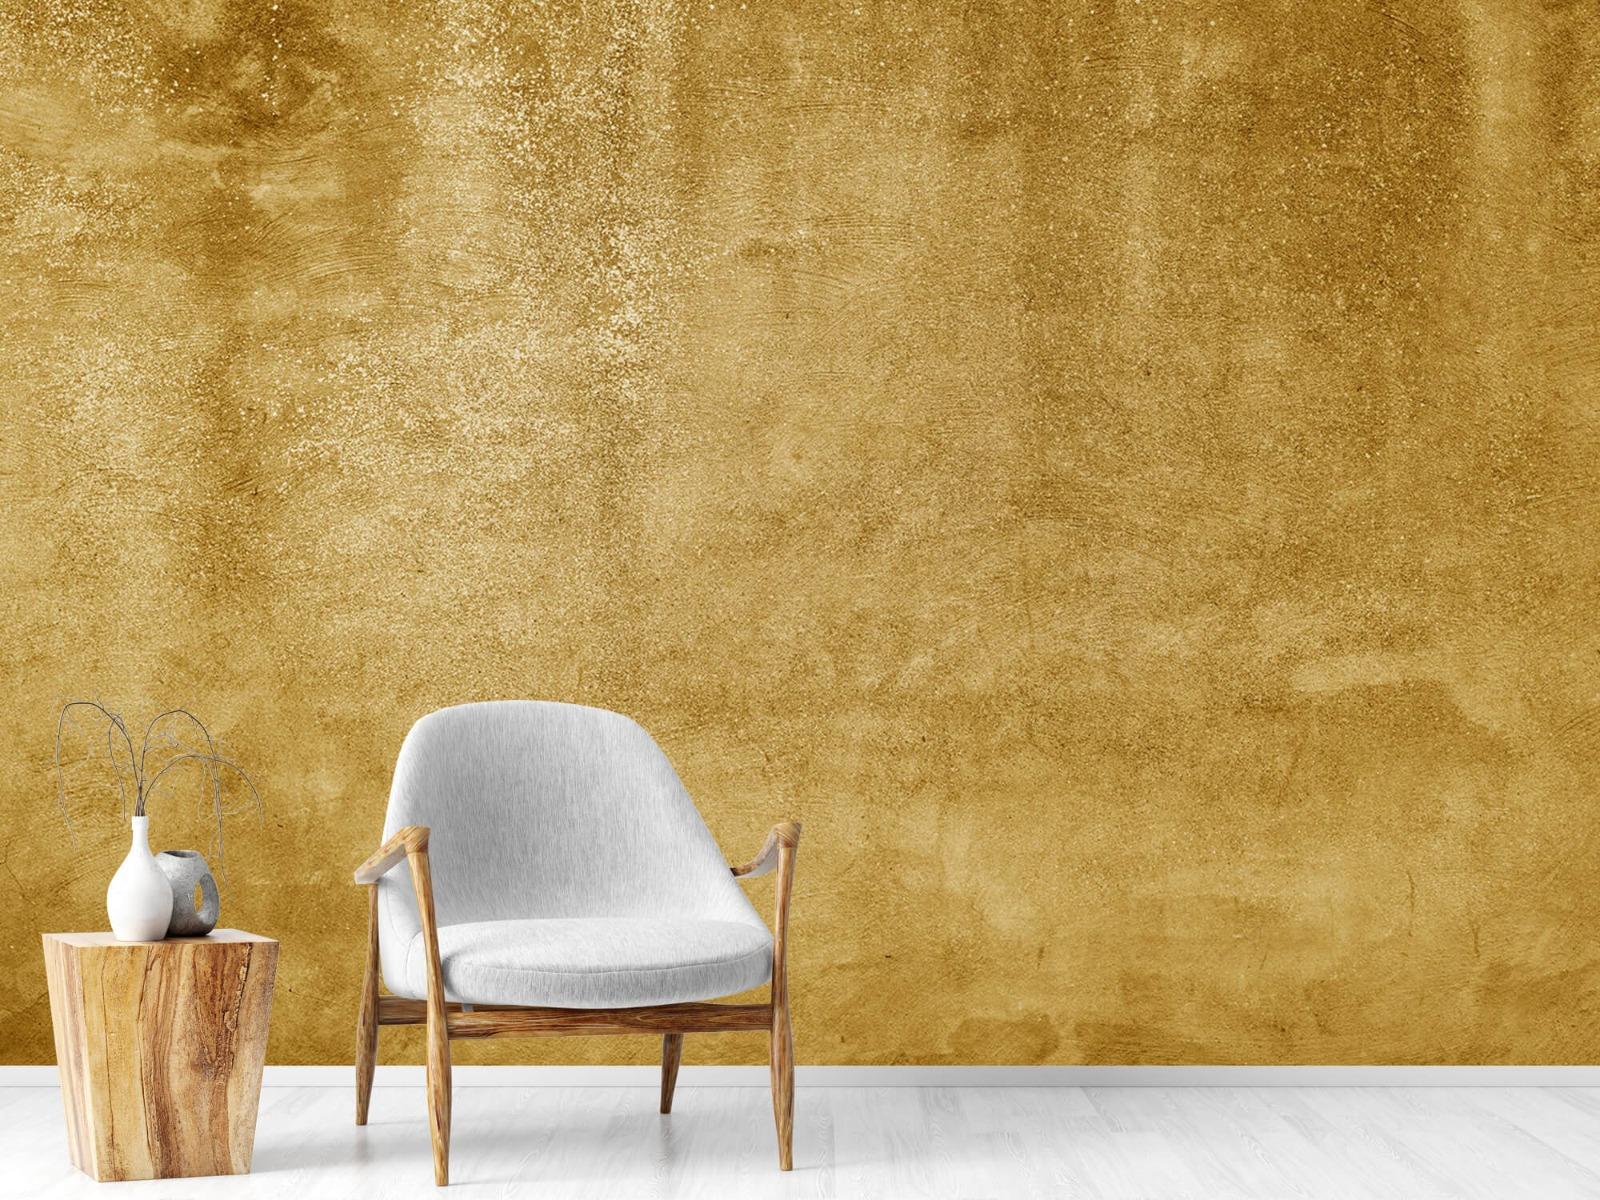 Betonlook behang - Oker geel beton - Woonkamer 18